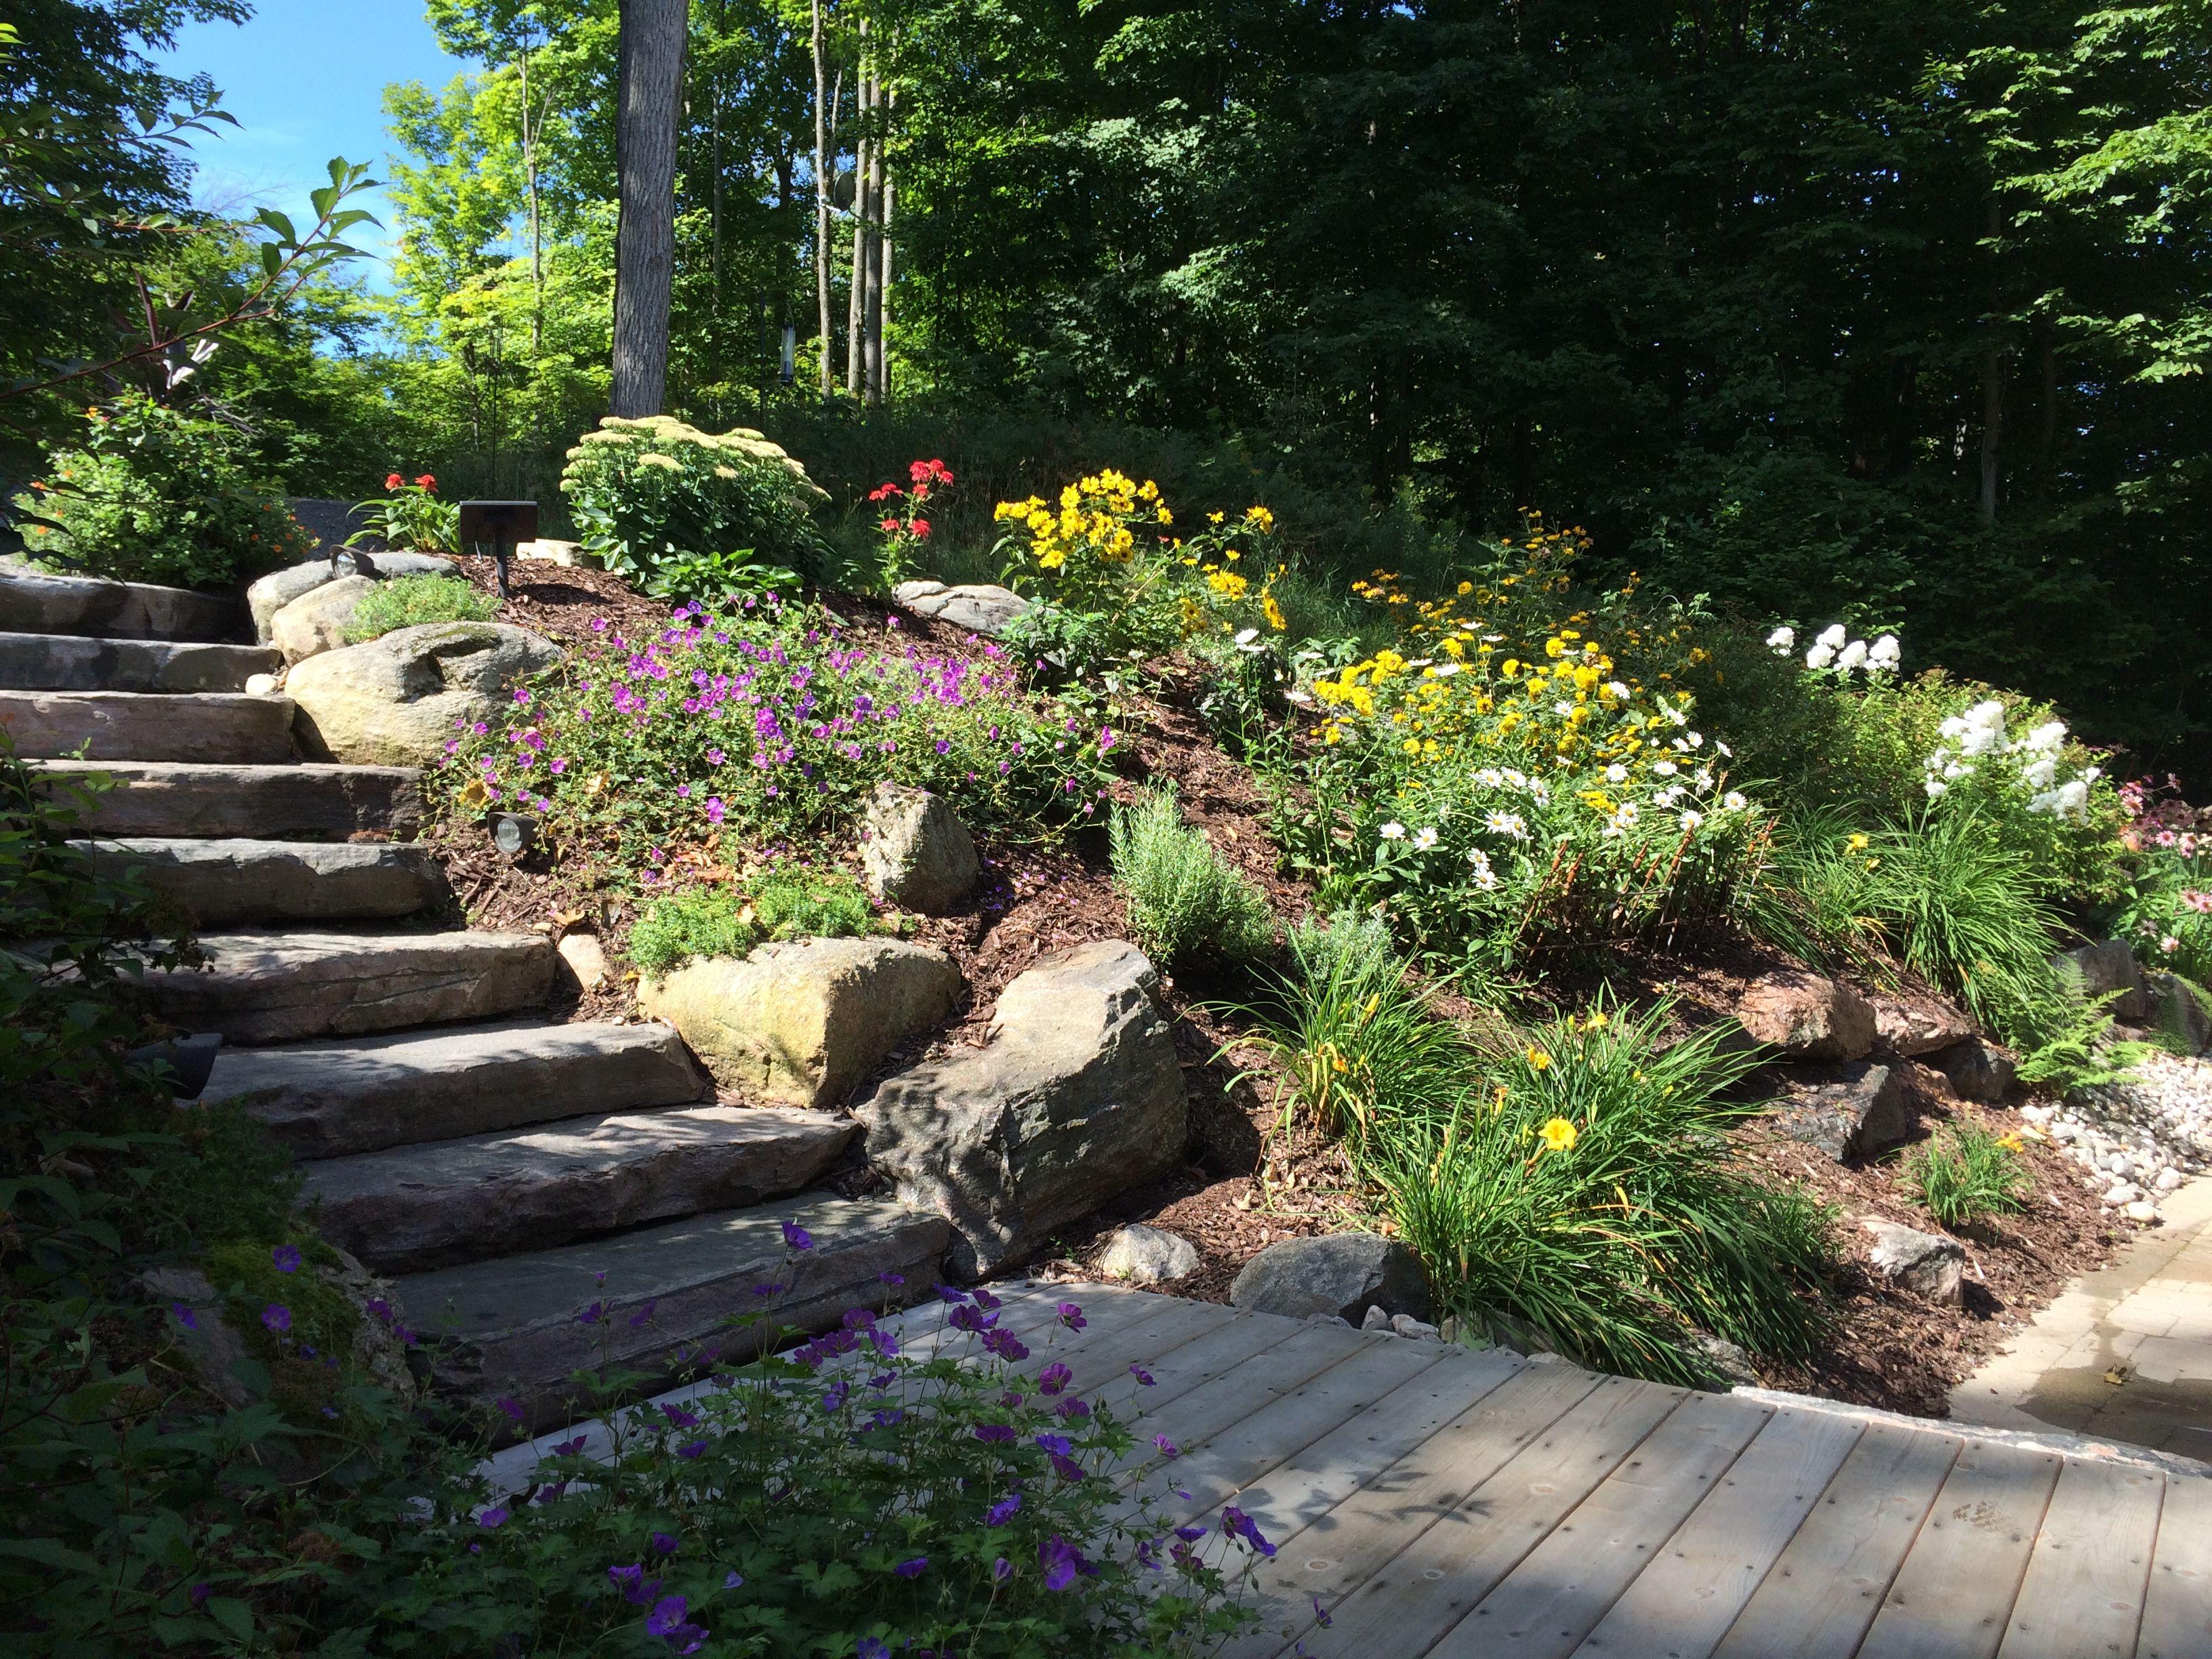 listing joe lake original on muskoka pine little white online rosseau rentals rental cottage